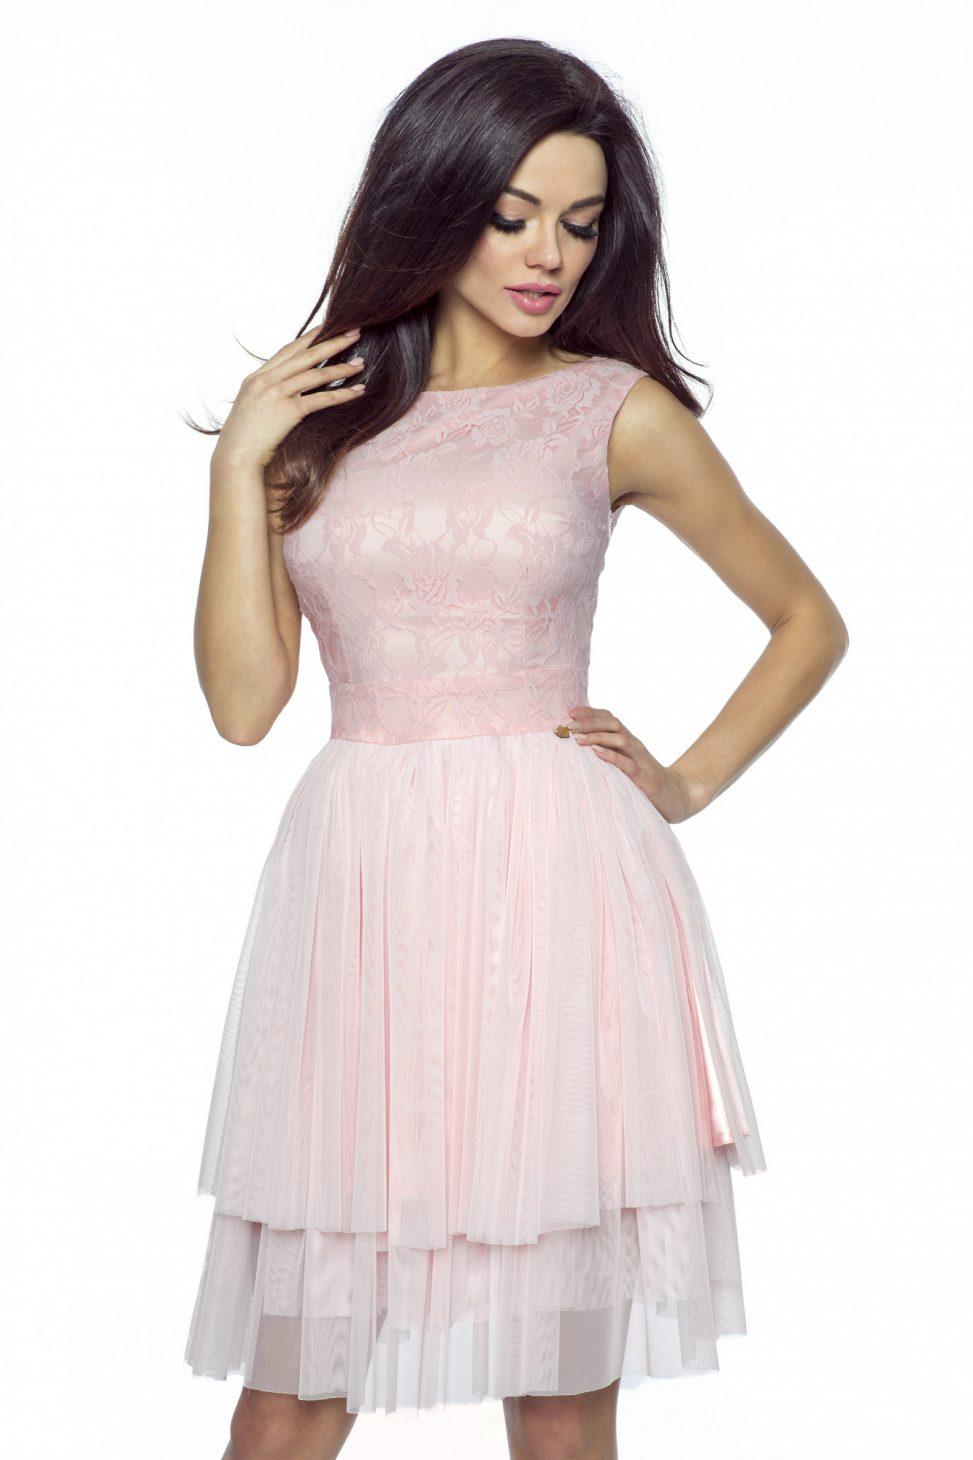 Tiulowo koronkowa sukienka pudrowa